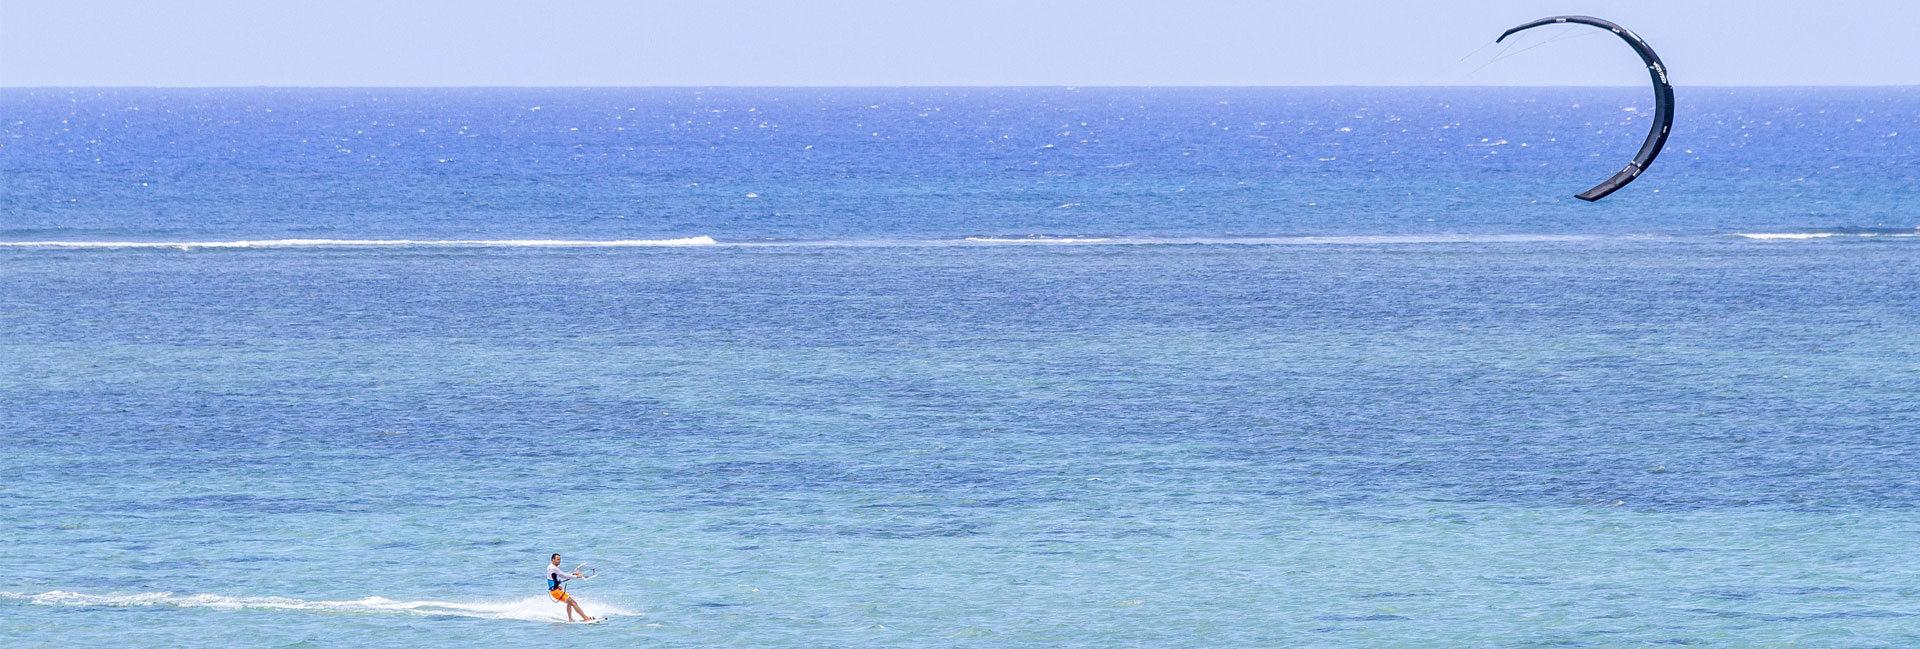 kite-alone-in-paradise-mauritius